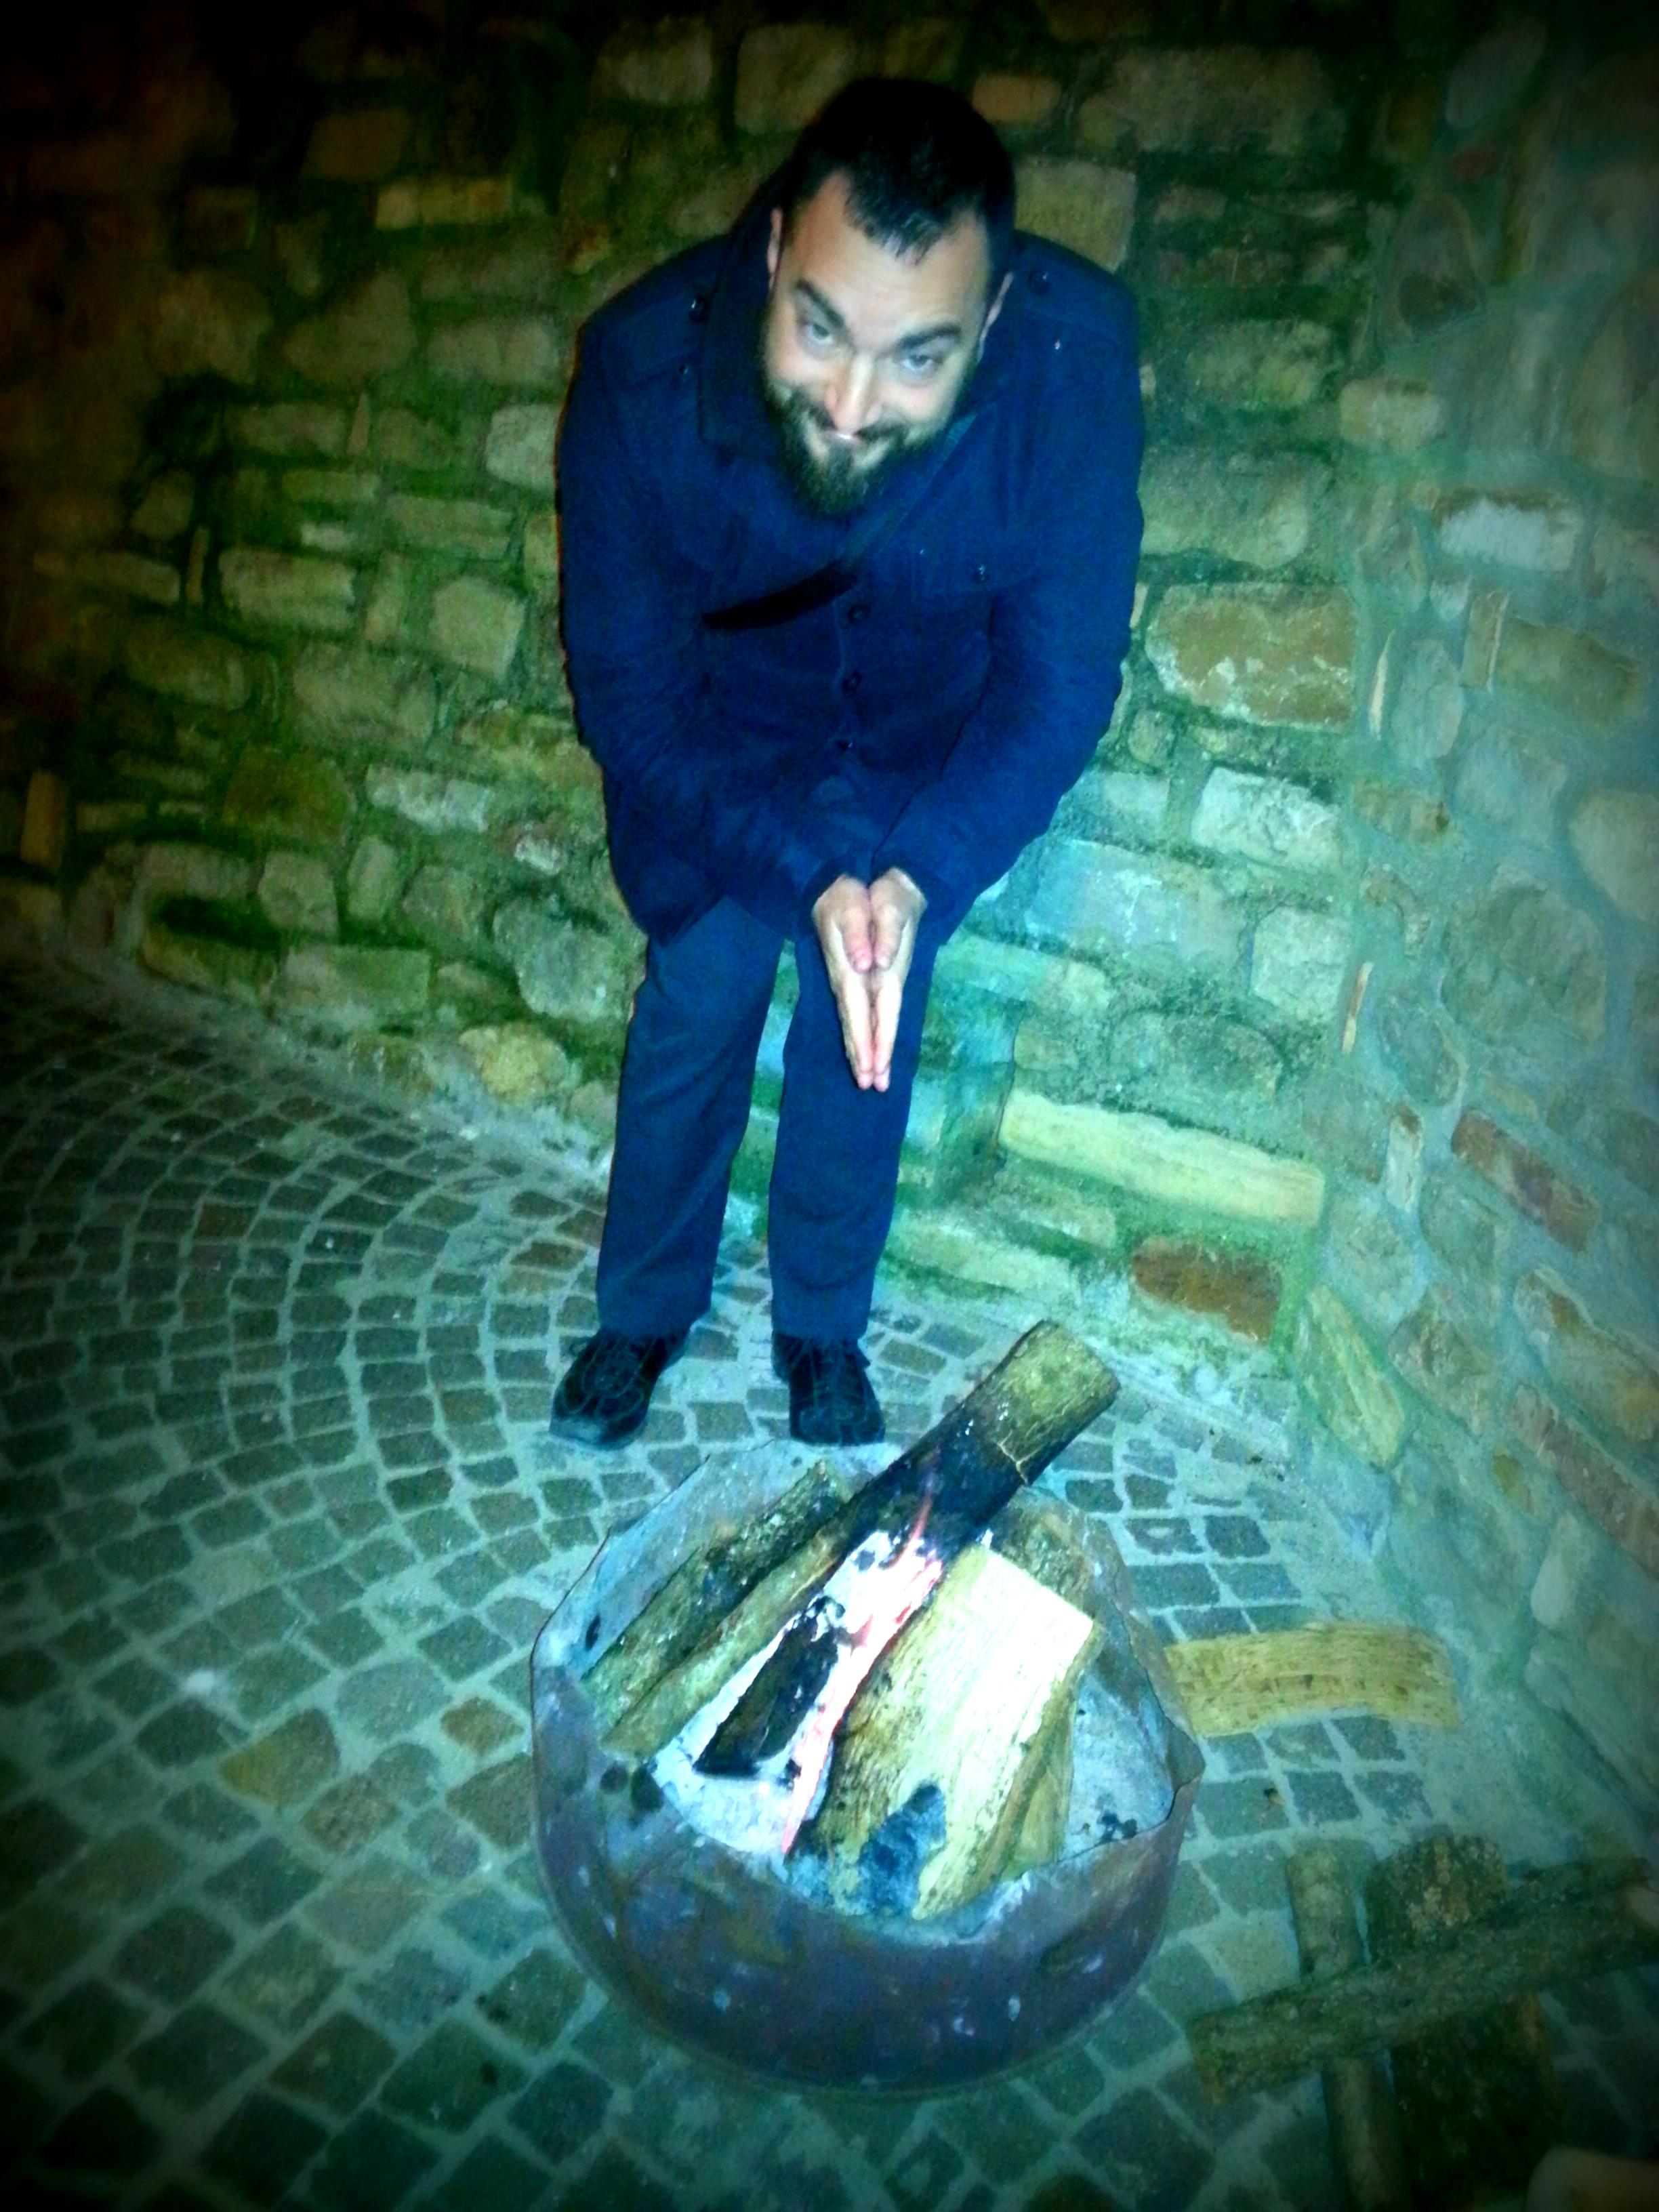 Saffron getting warm around the streets of Cermignano